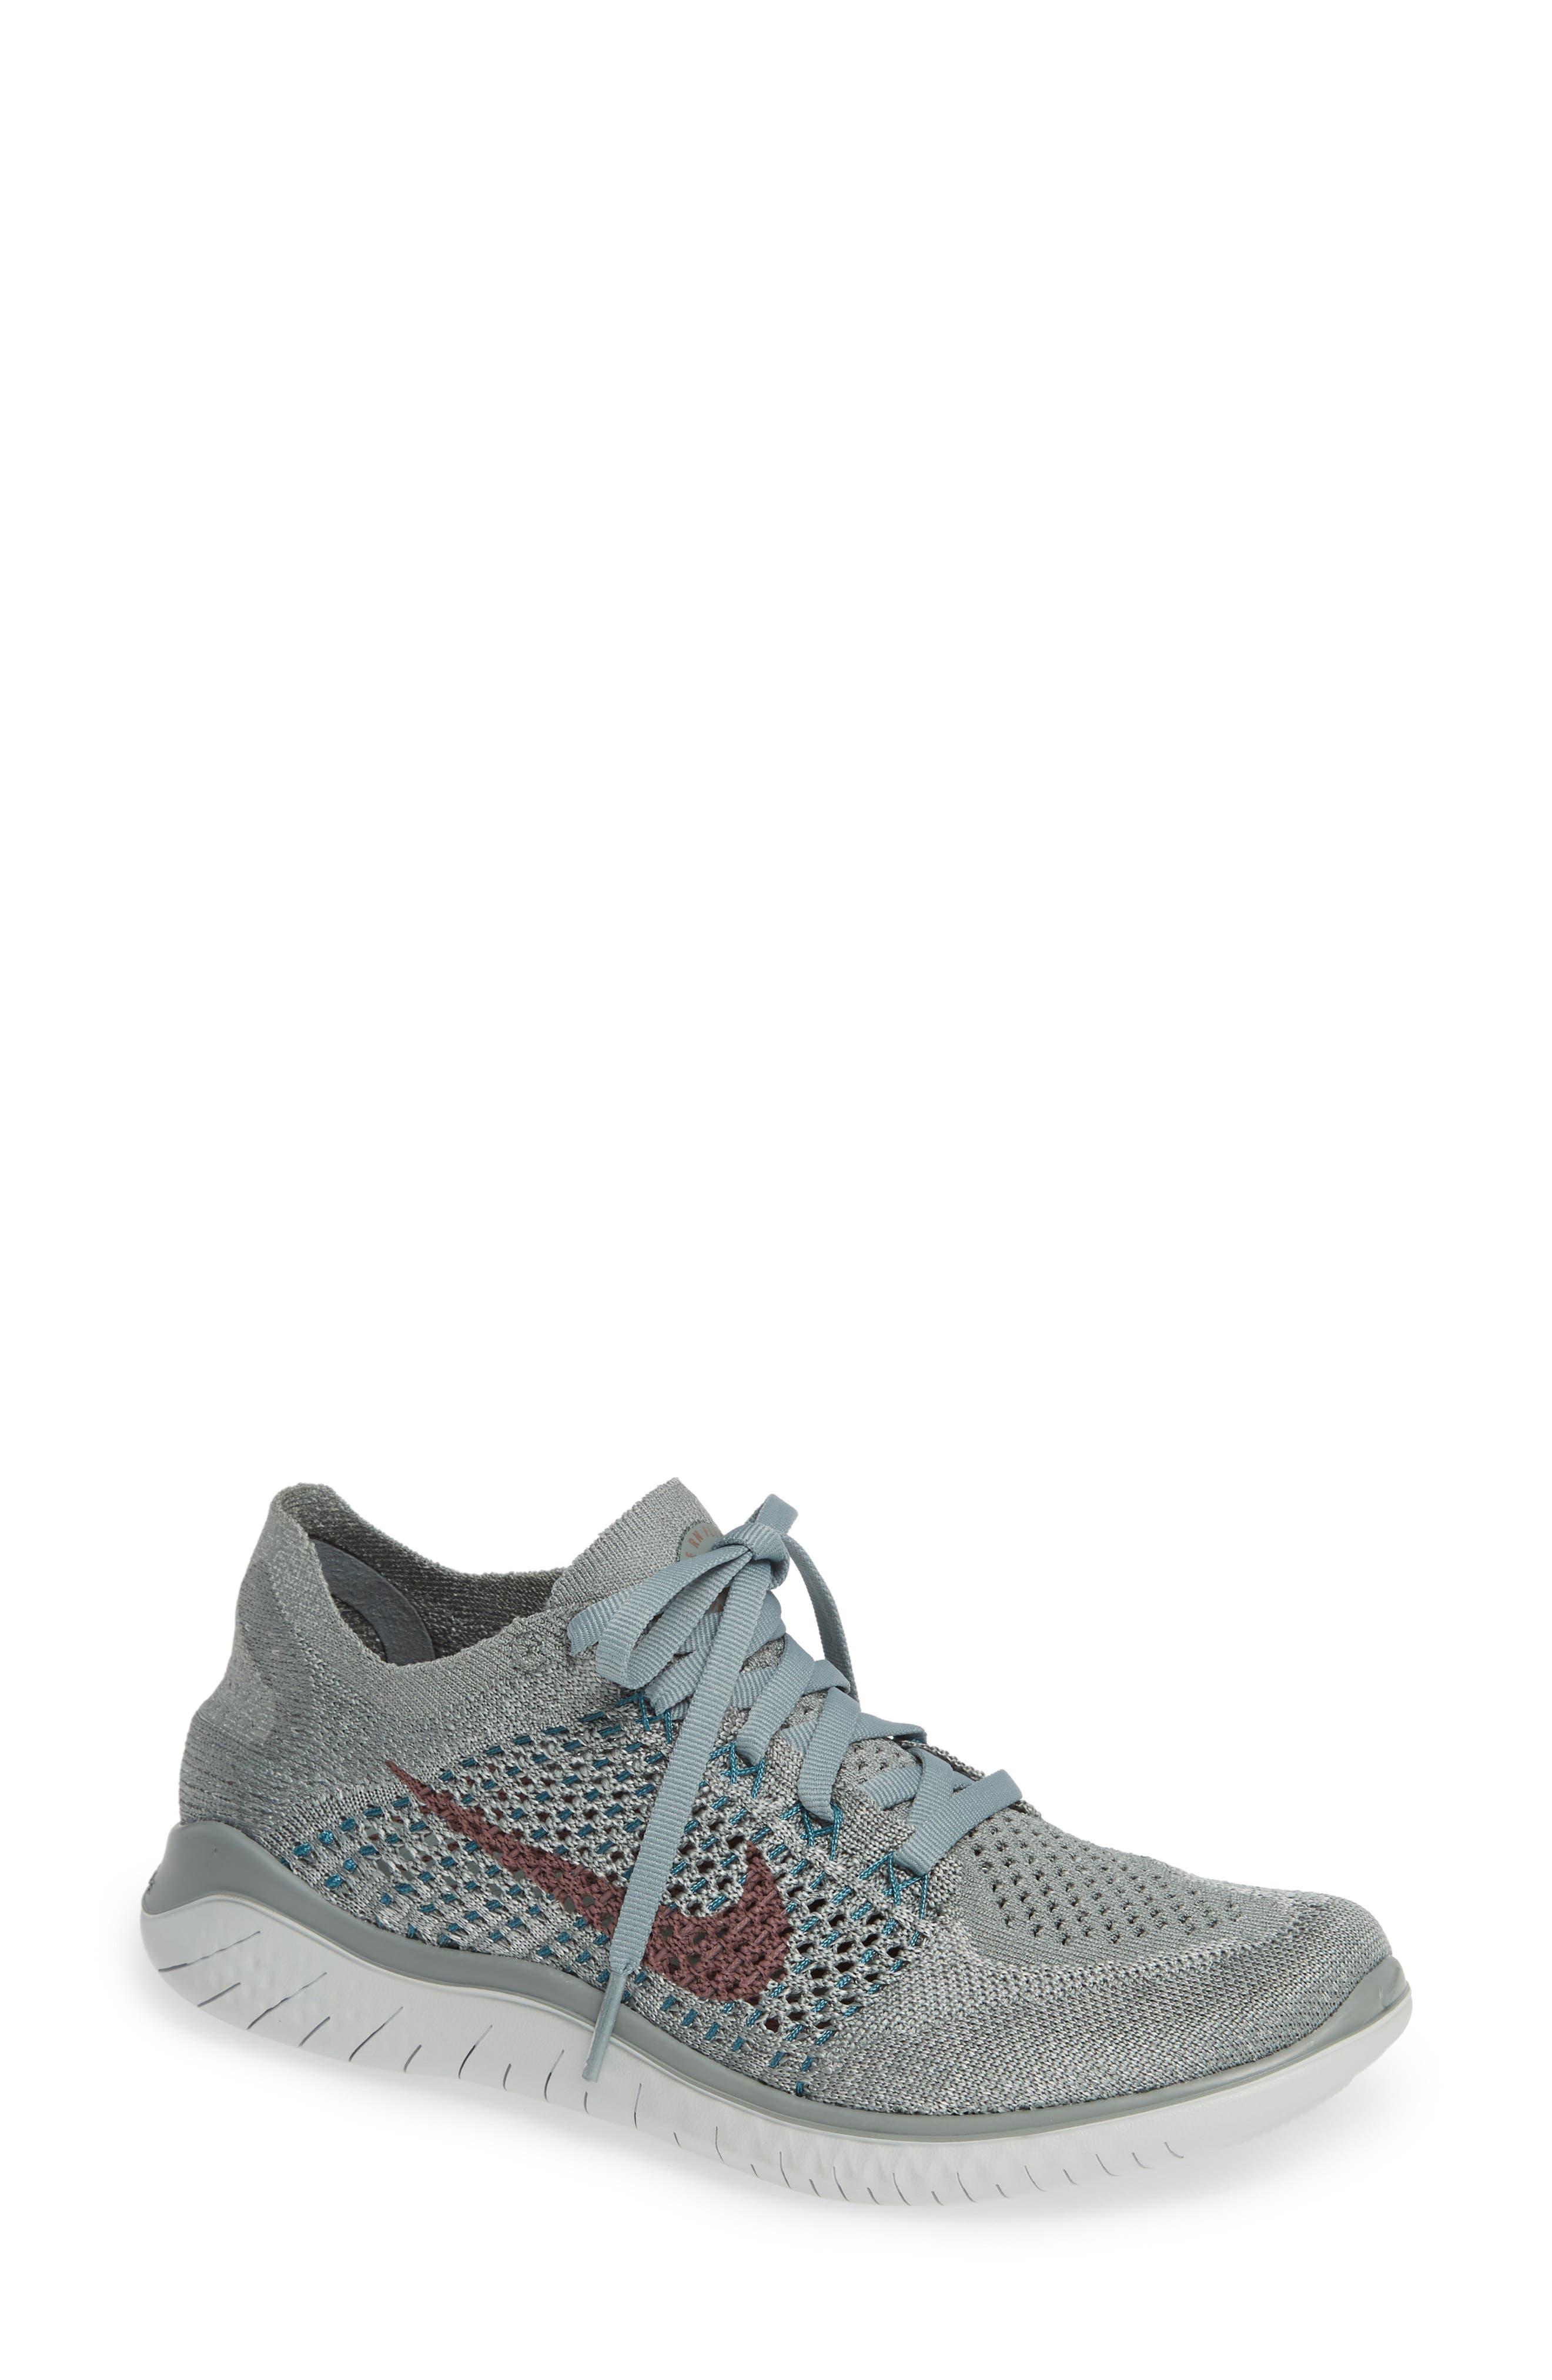 NIKE Free RN Flyknit 2018 Running Shoe, Main, color, 300